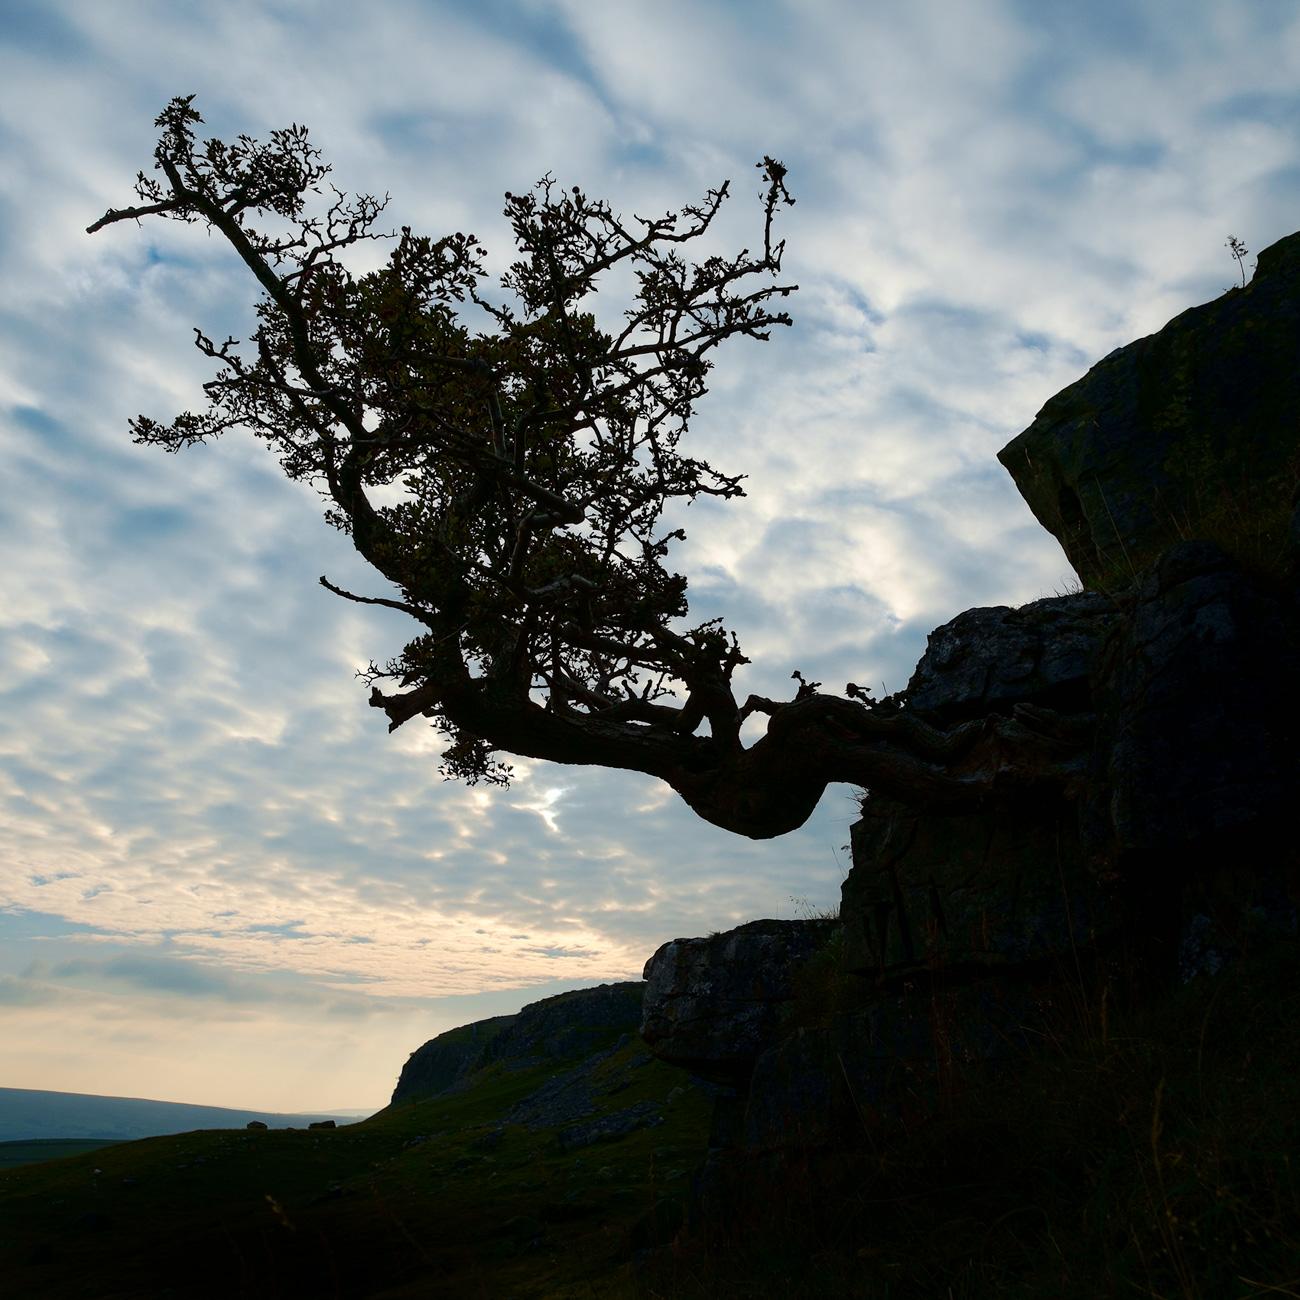 Hawthorn silhouette, Norber erratics